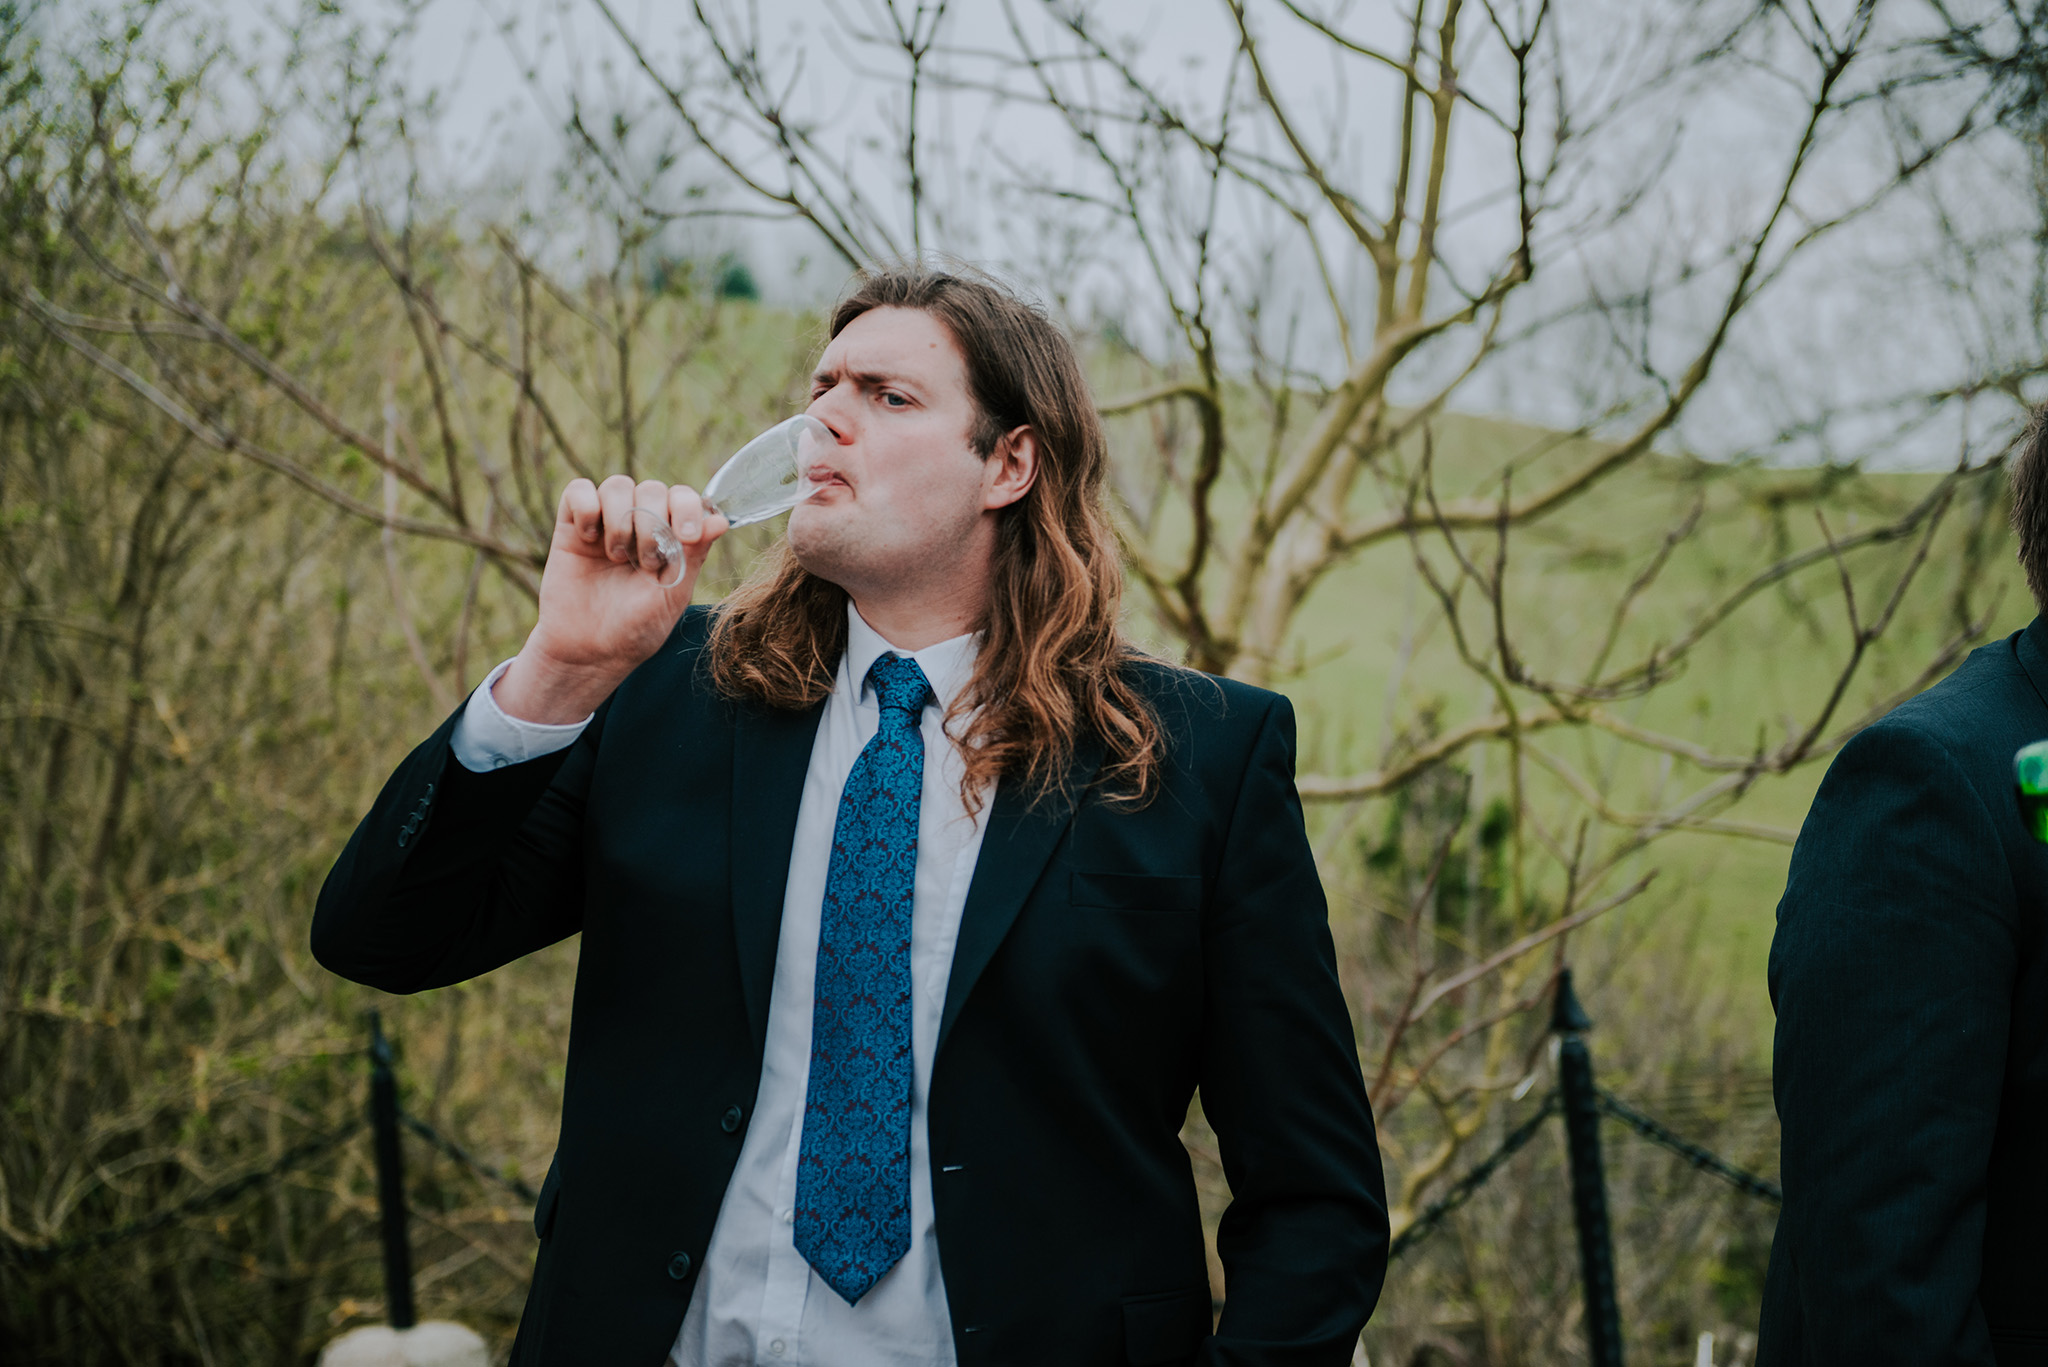 scott-stockwell-photography-wedding-18.jpg